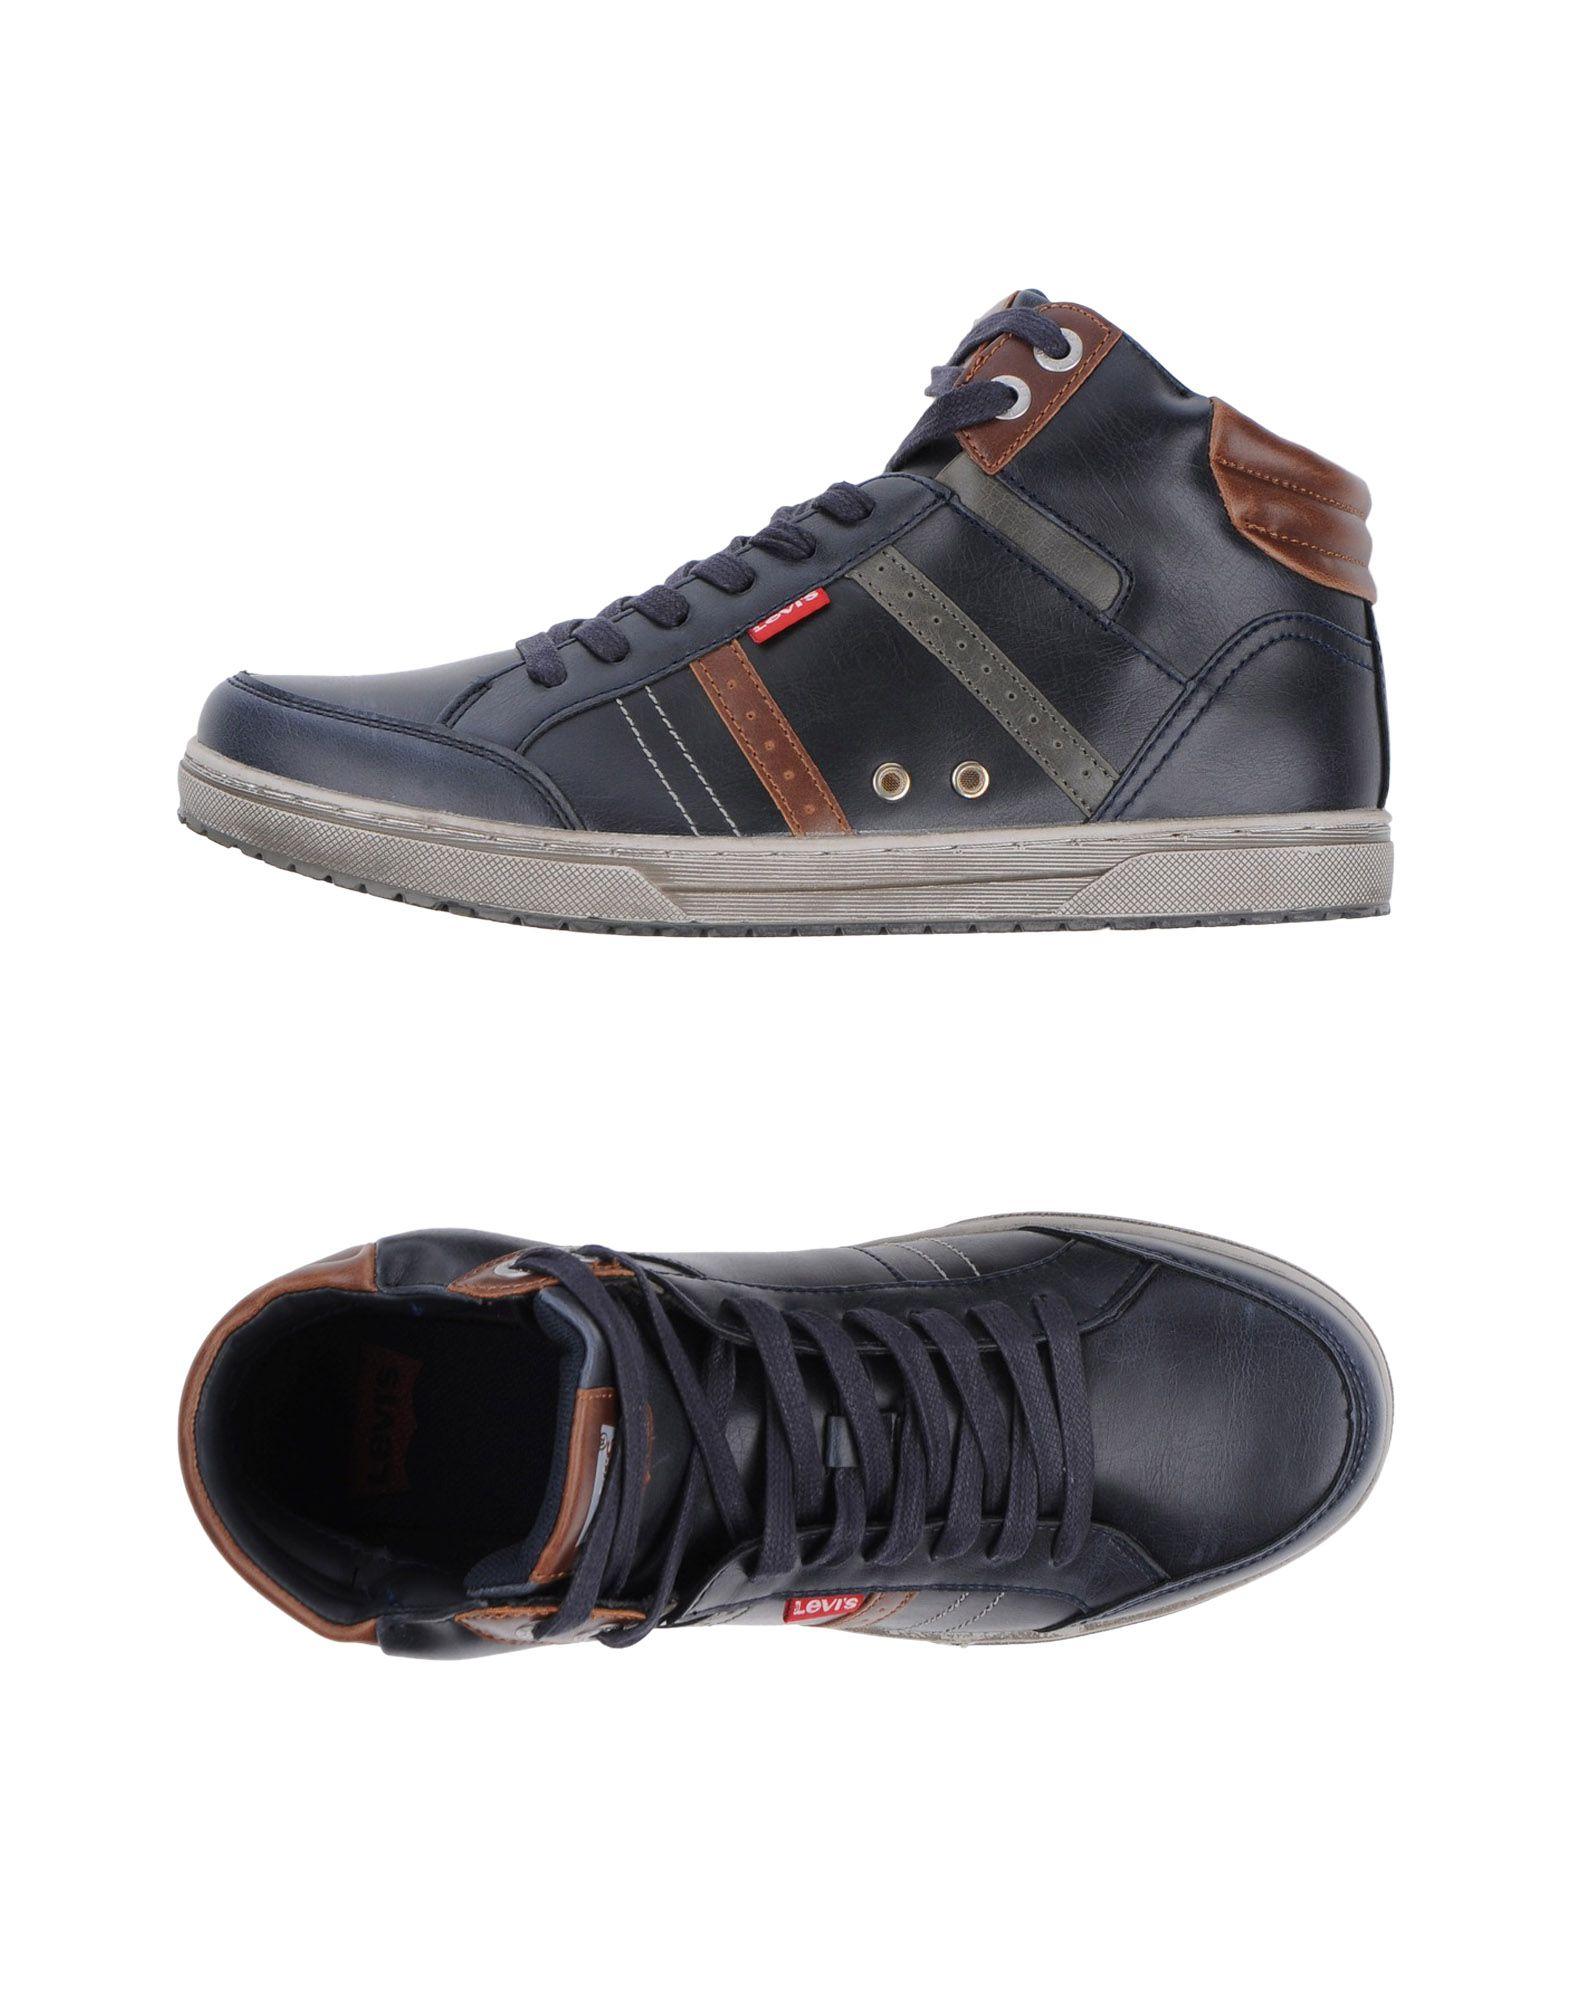 Sneakers Levi's Red Tab Uomo - 11147675VU